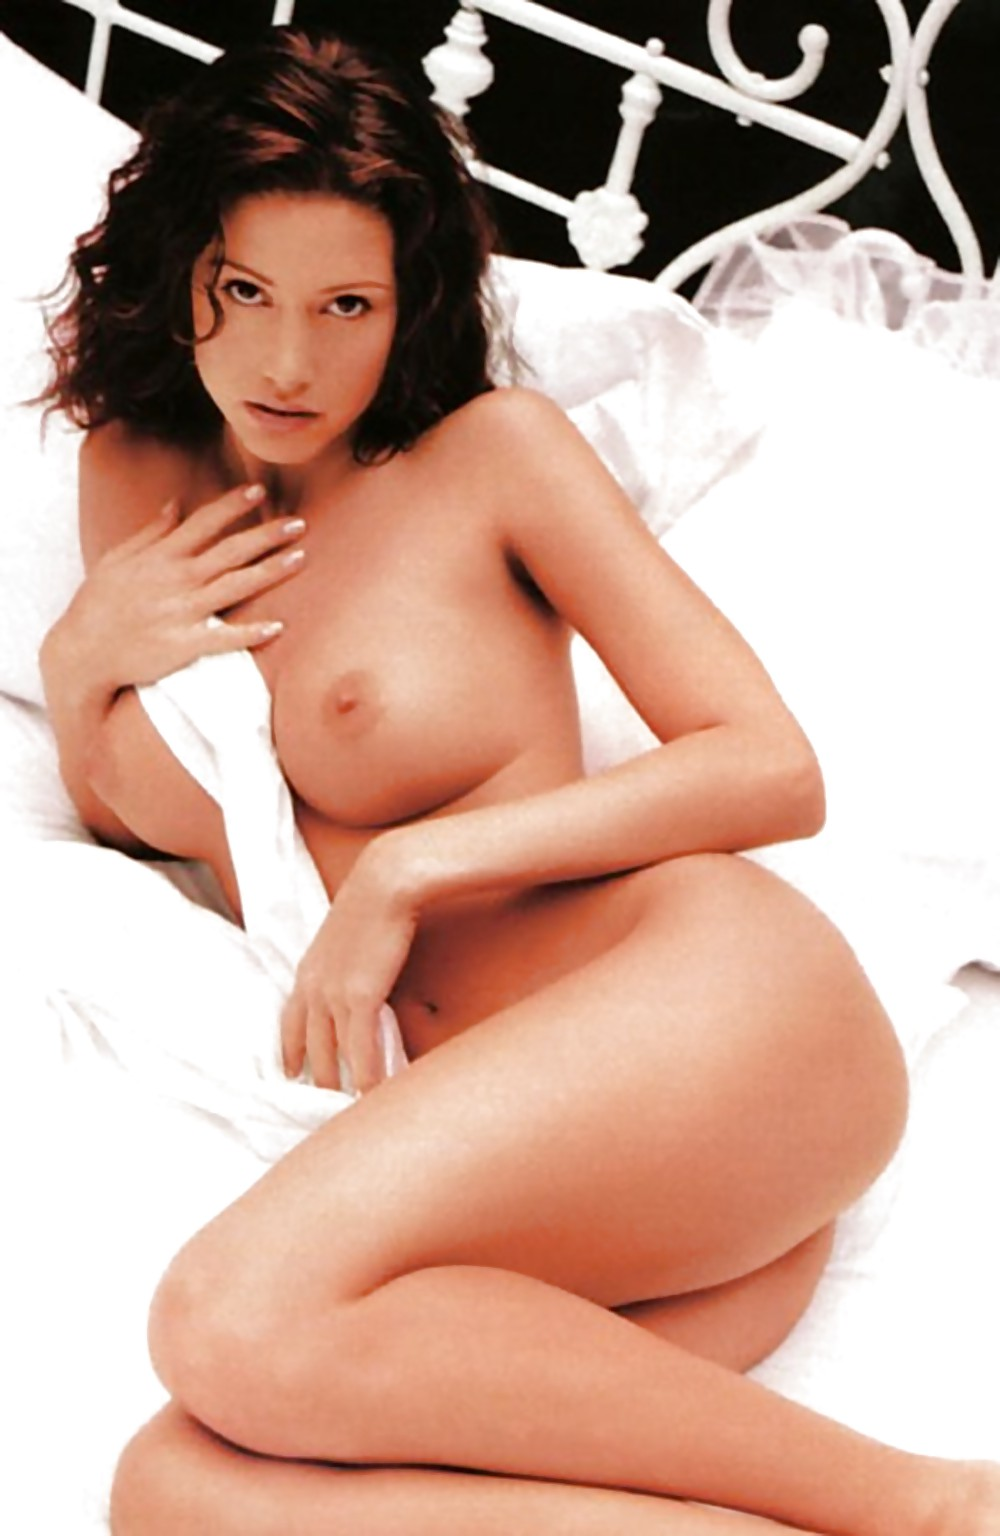 Shannon elizabeth bent over nude, sexy school girls amateur pics